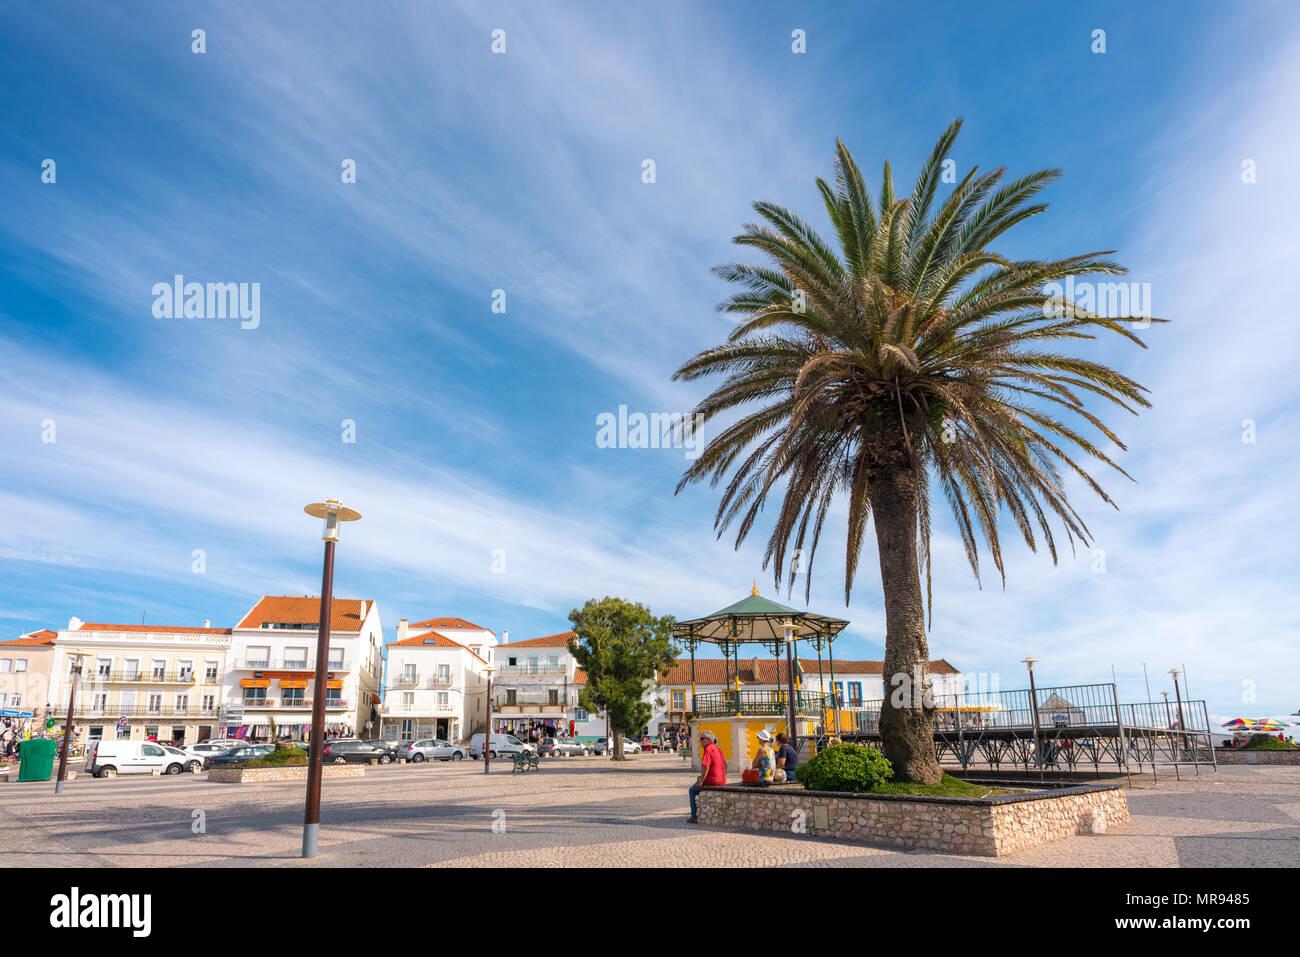 Nazare in Portugal - Stock Image